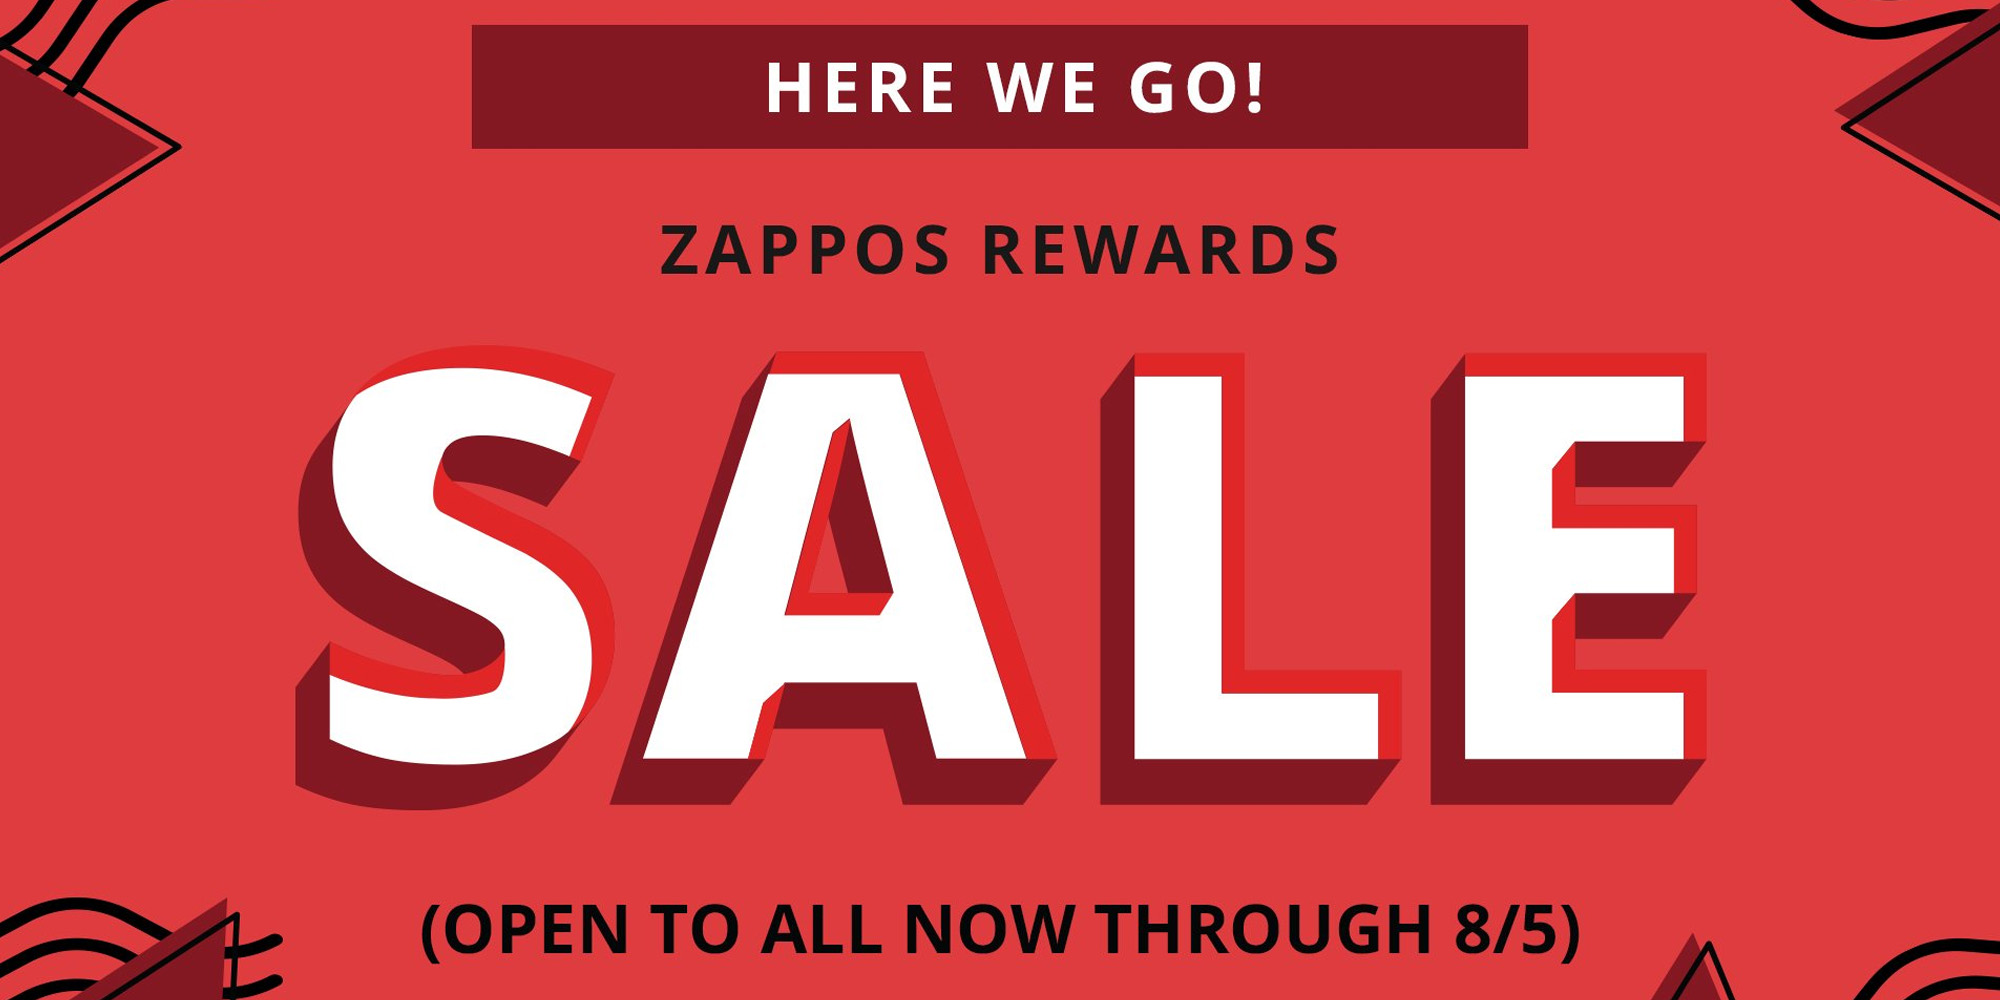 Zappos Rewards vente: Sale avec 40 000 articles Zappos en vente: avec Nike , ASICS , Columbia 6ba1d21 - canadian-onlinepharmacy.website